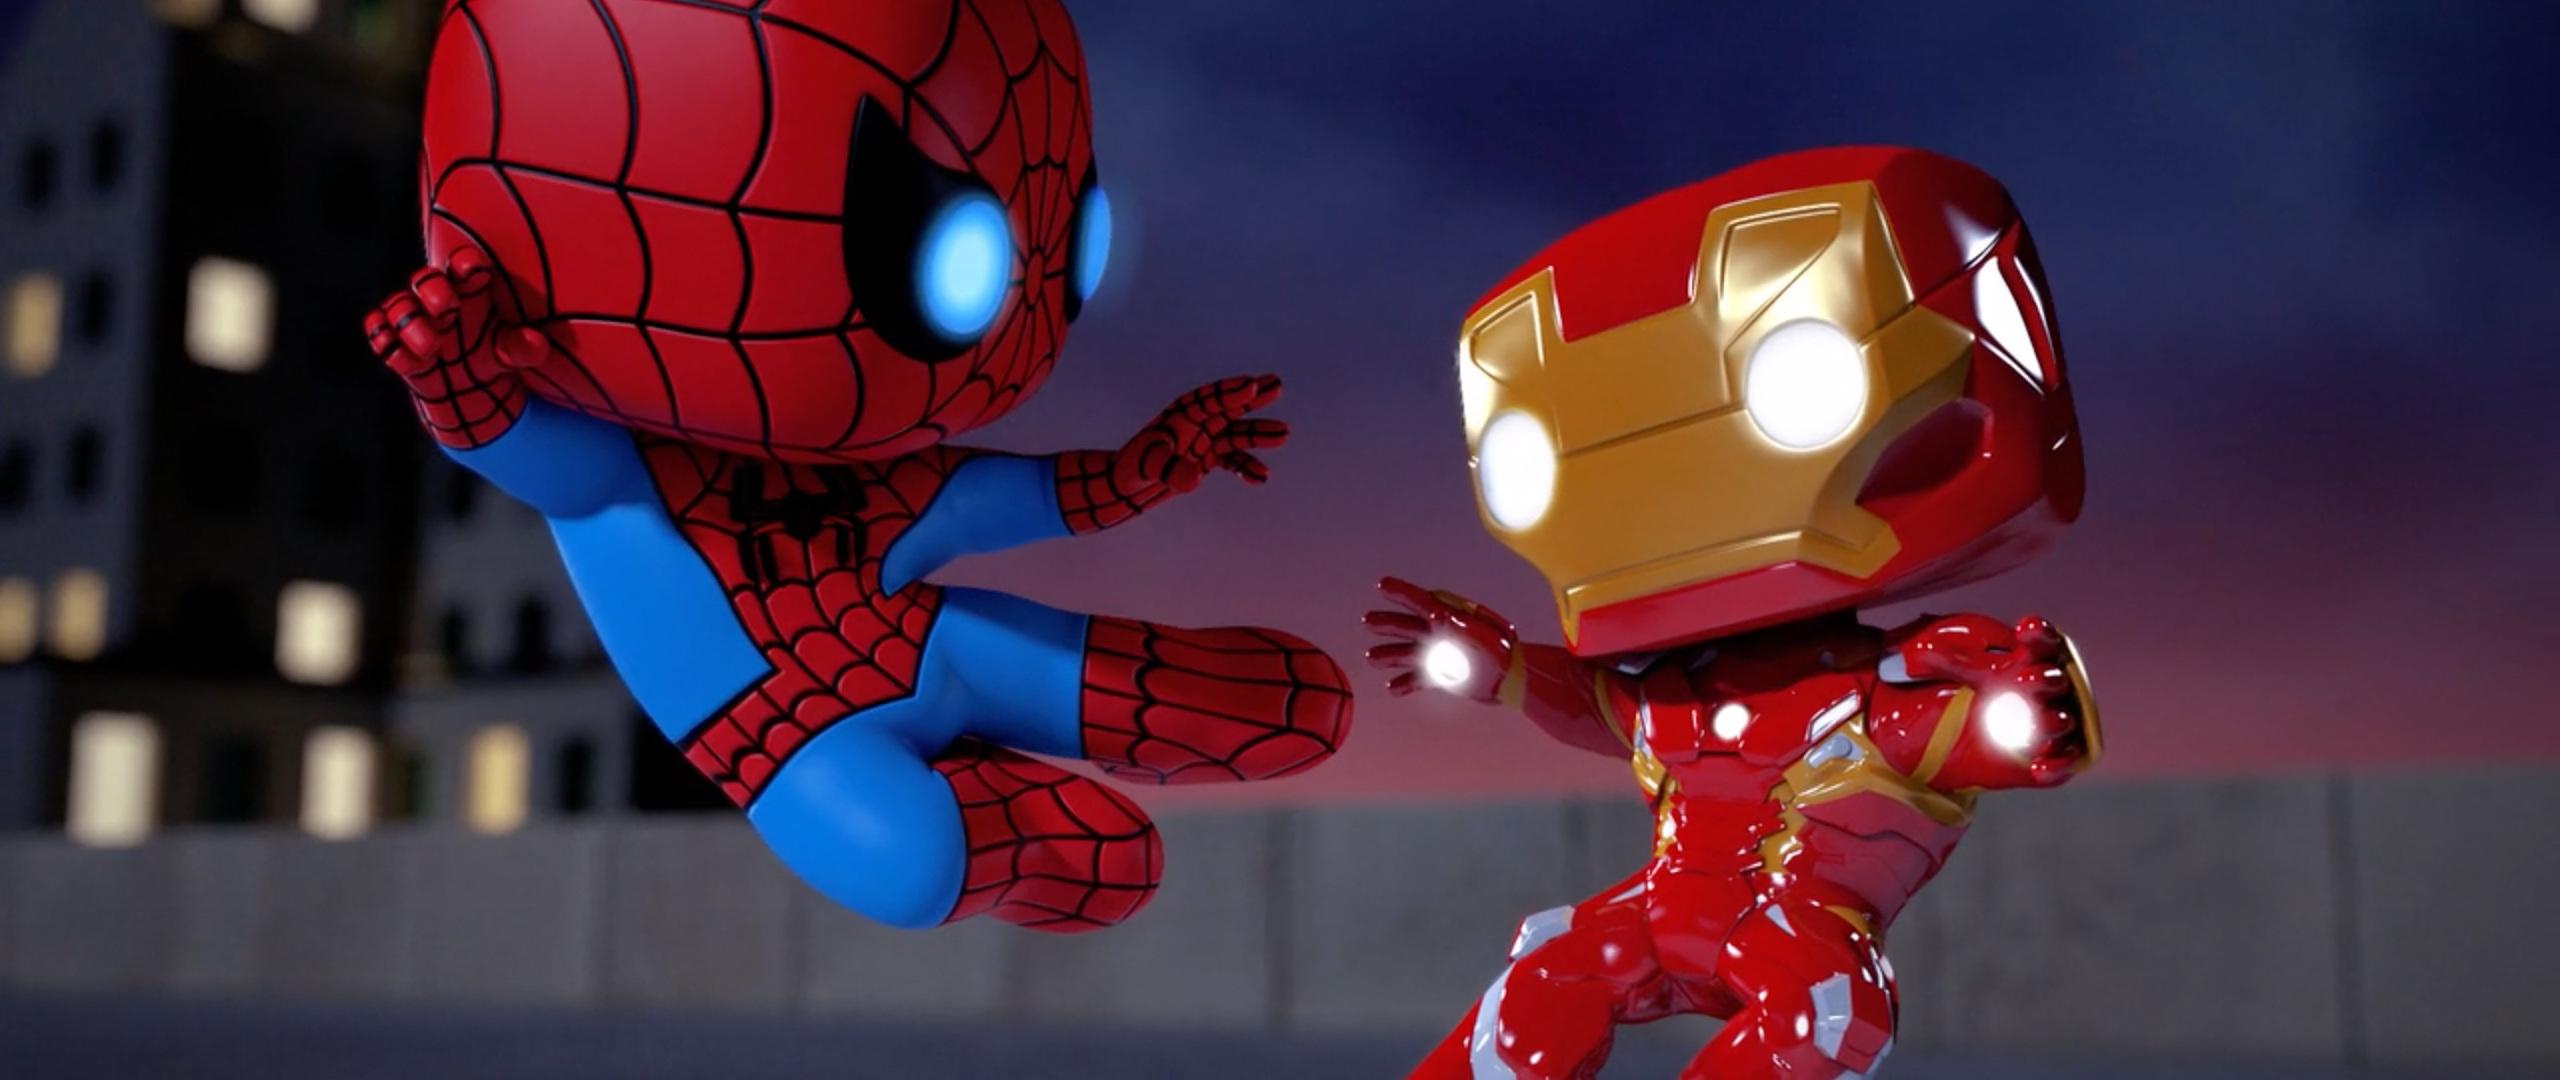 2560x1080 iron man vs spiderman spellbound animated movie - Iron man cartoon download ...